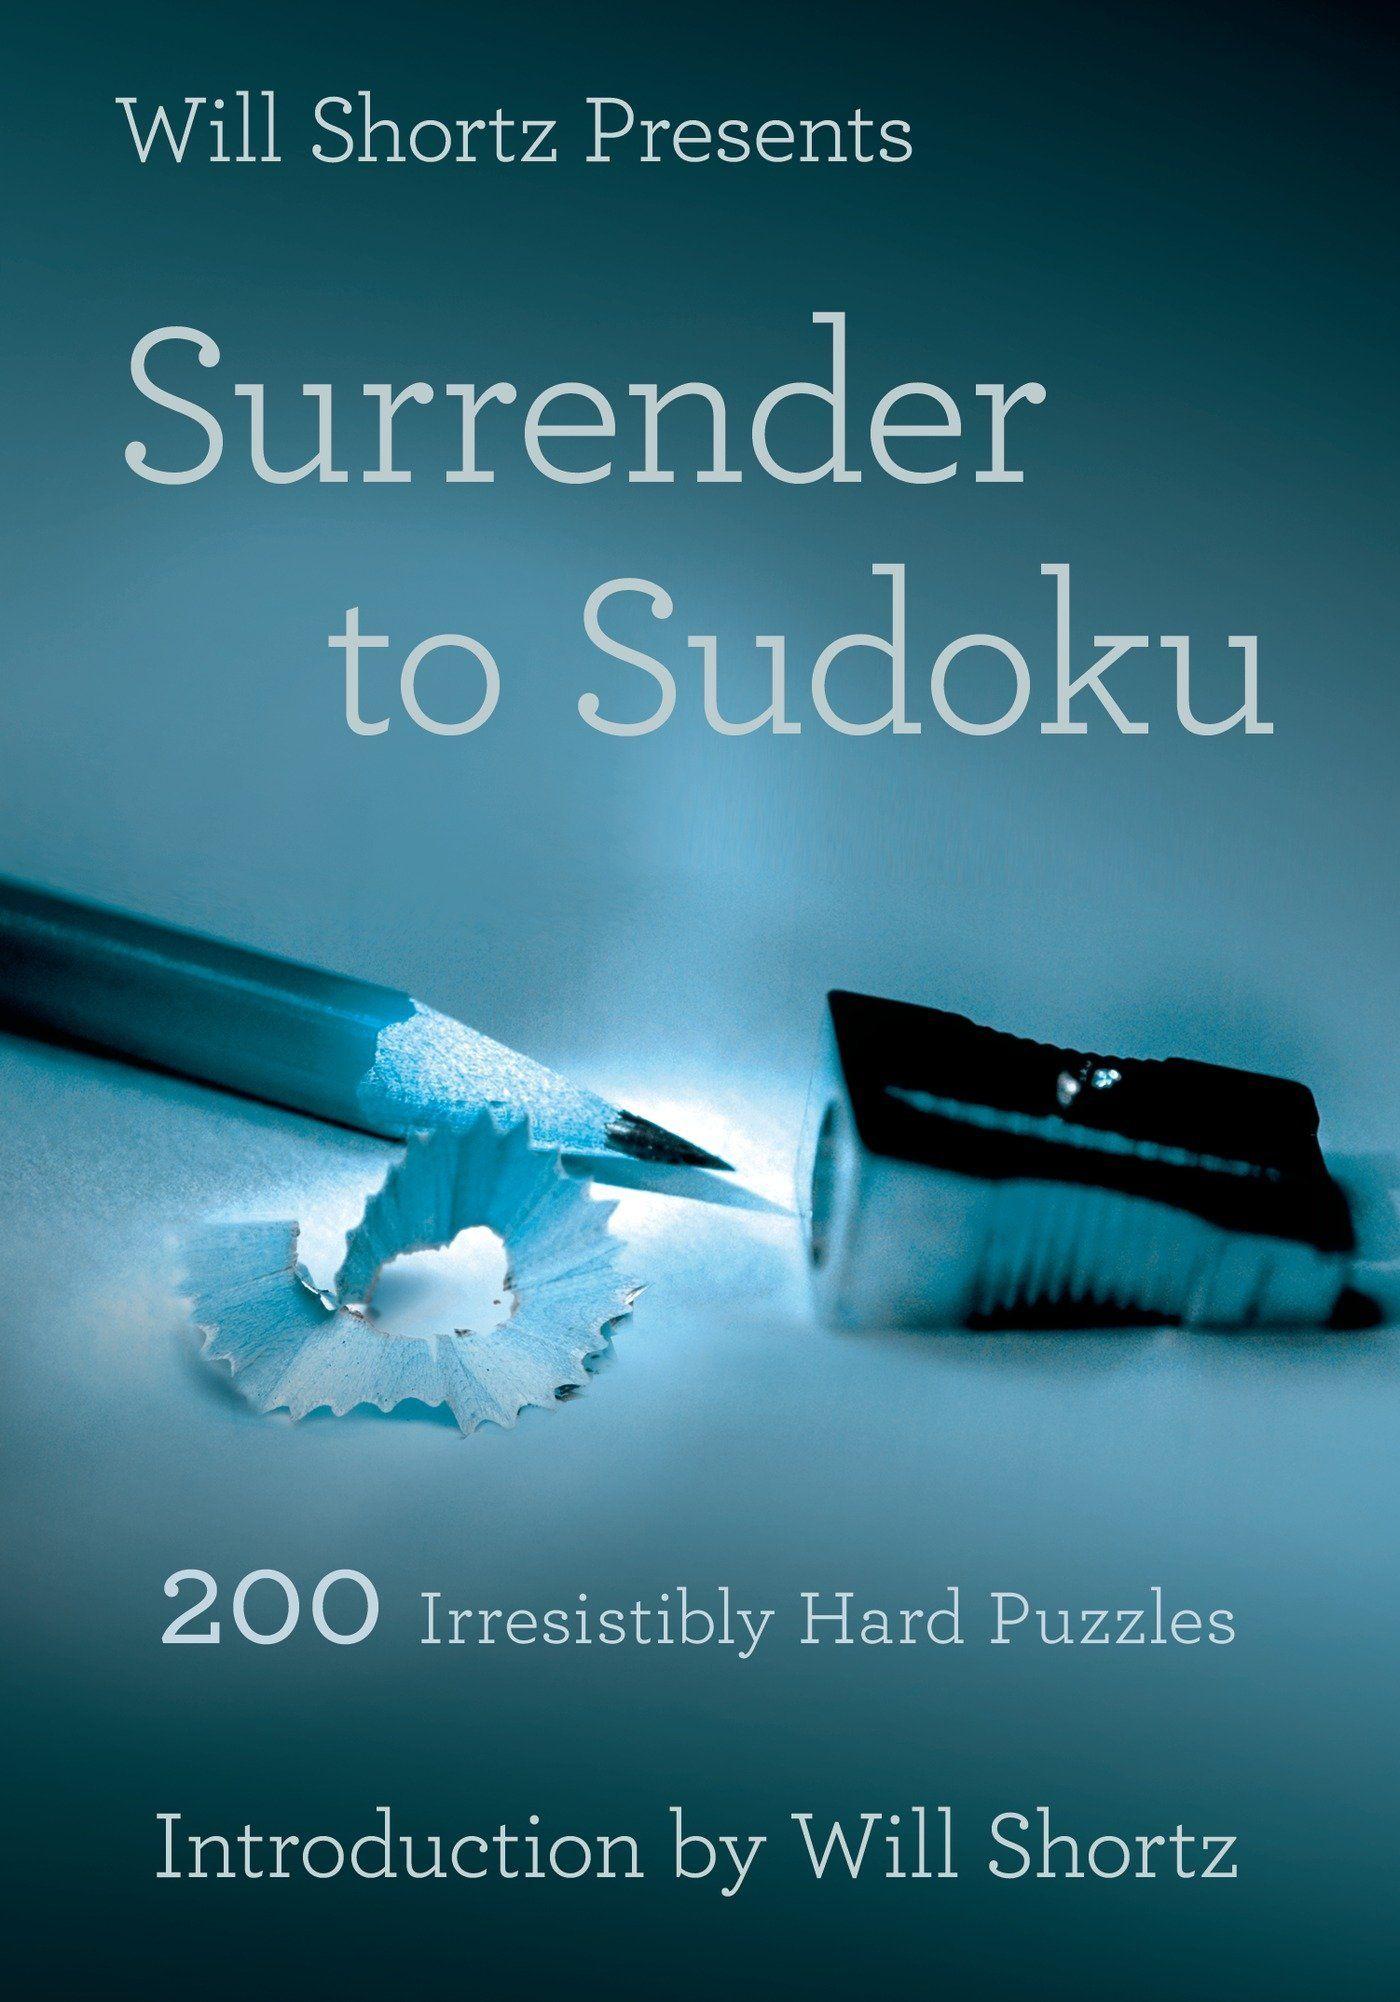 Will Shortz Presents Surrender To Sudoku 200 Irresistibly